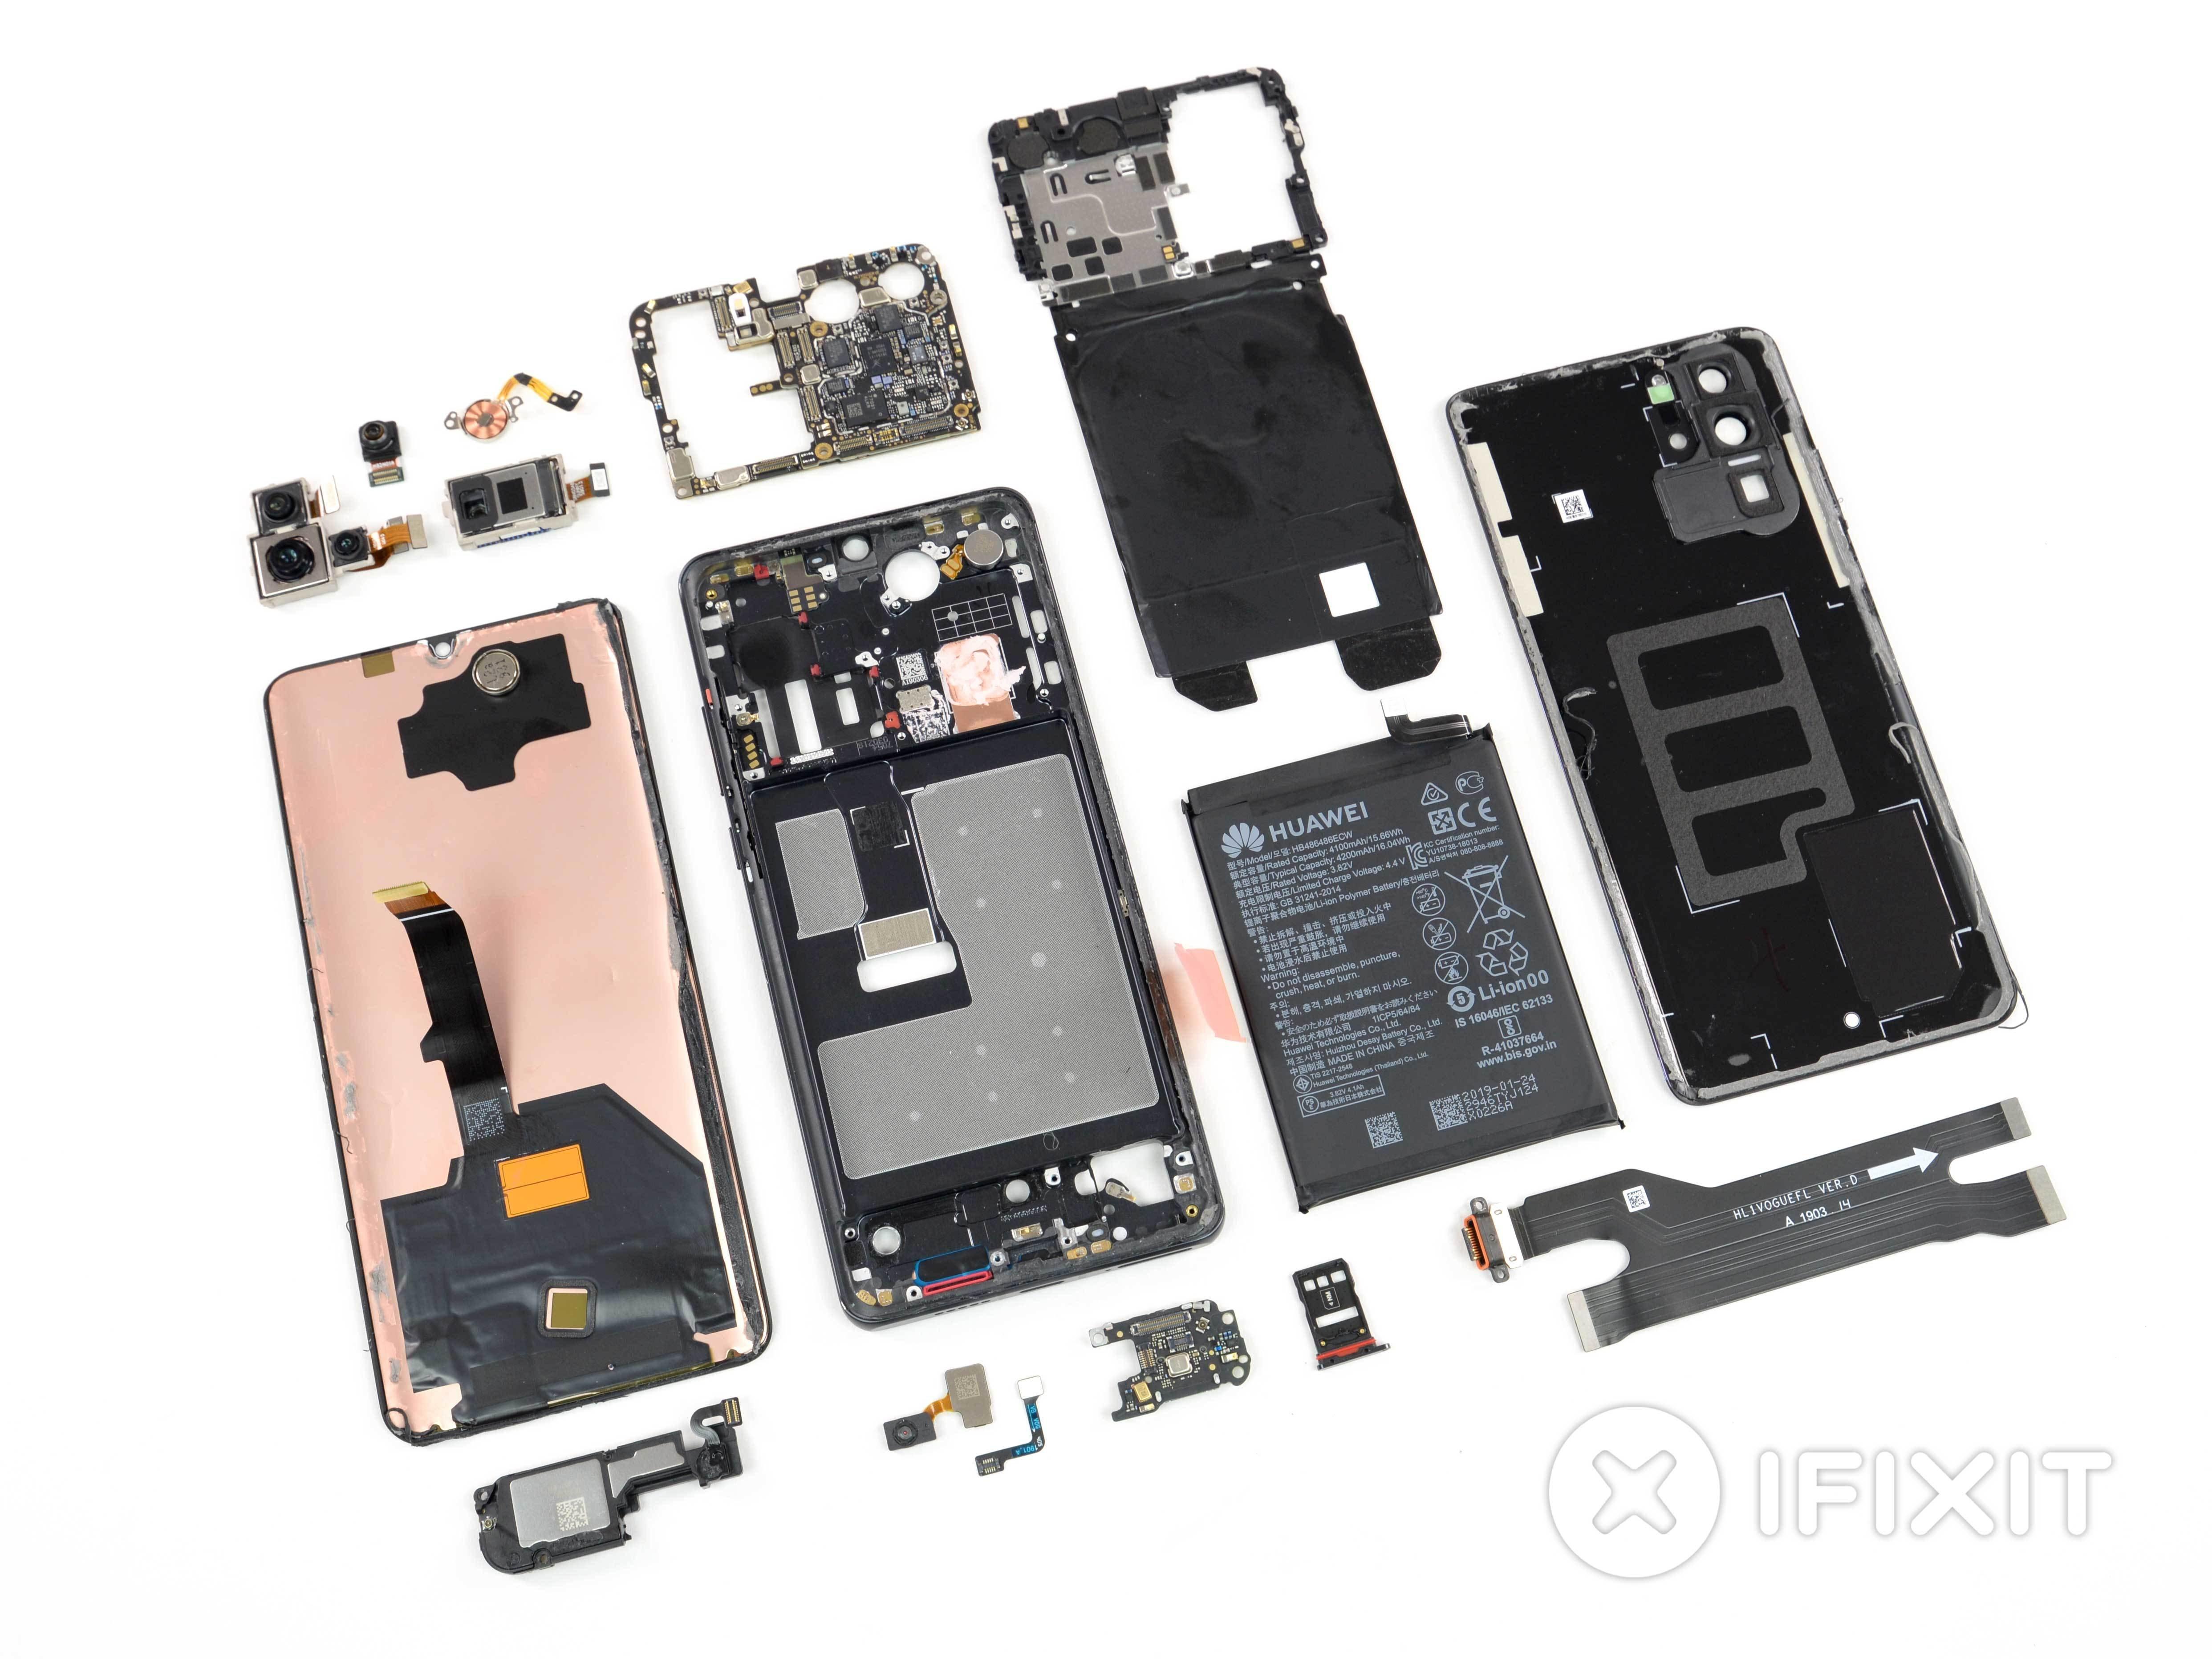 Huawei P30 Pro Teardown - iFixit